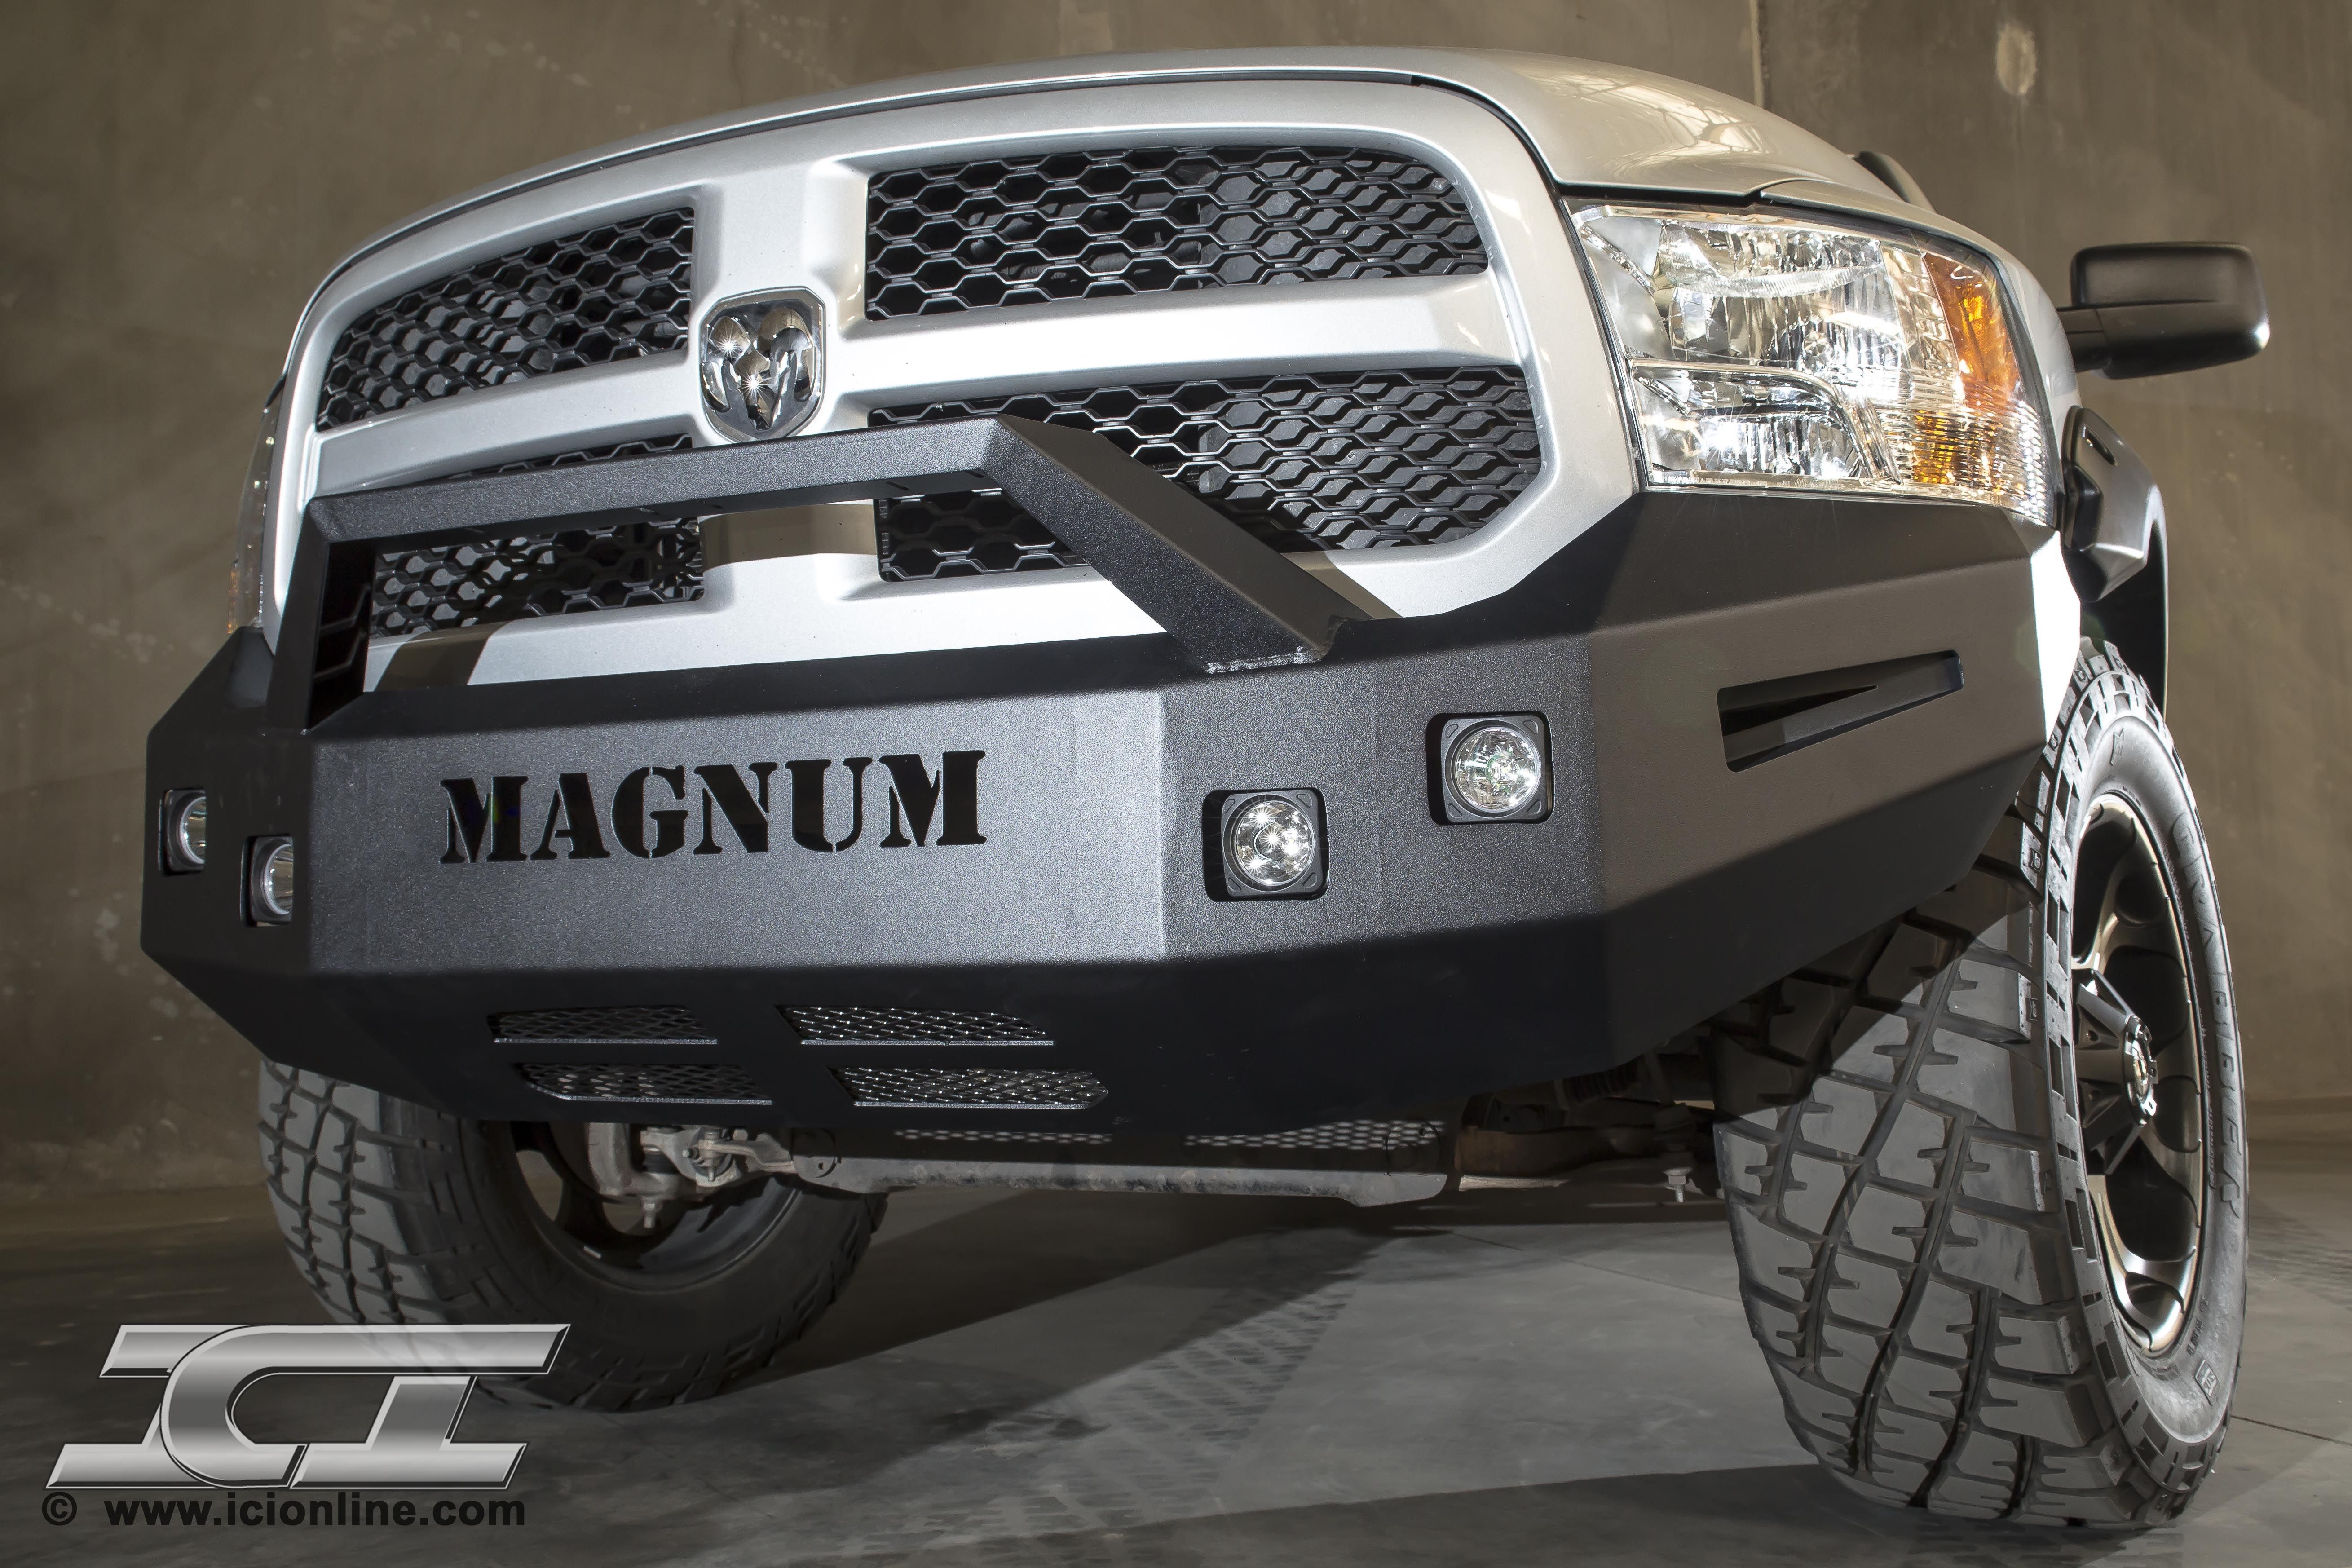 Front Magnum Bumper For 2009 2014 Dodge Ram 1500 Sport And Non Sport Trucks Part Fbm64dgn Truck Accesories Sport Truck Dodge Ram